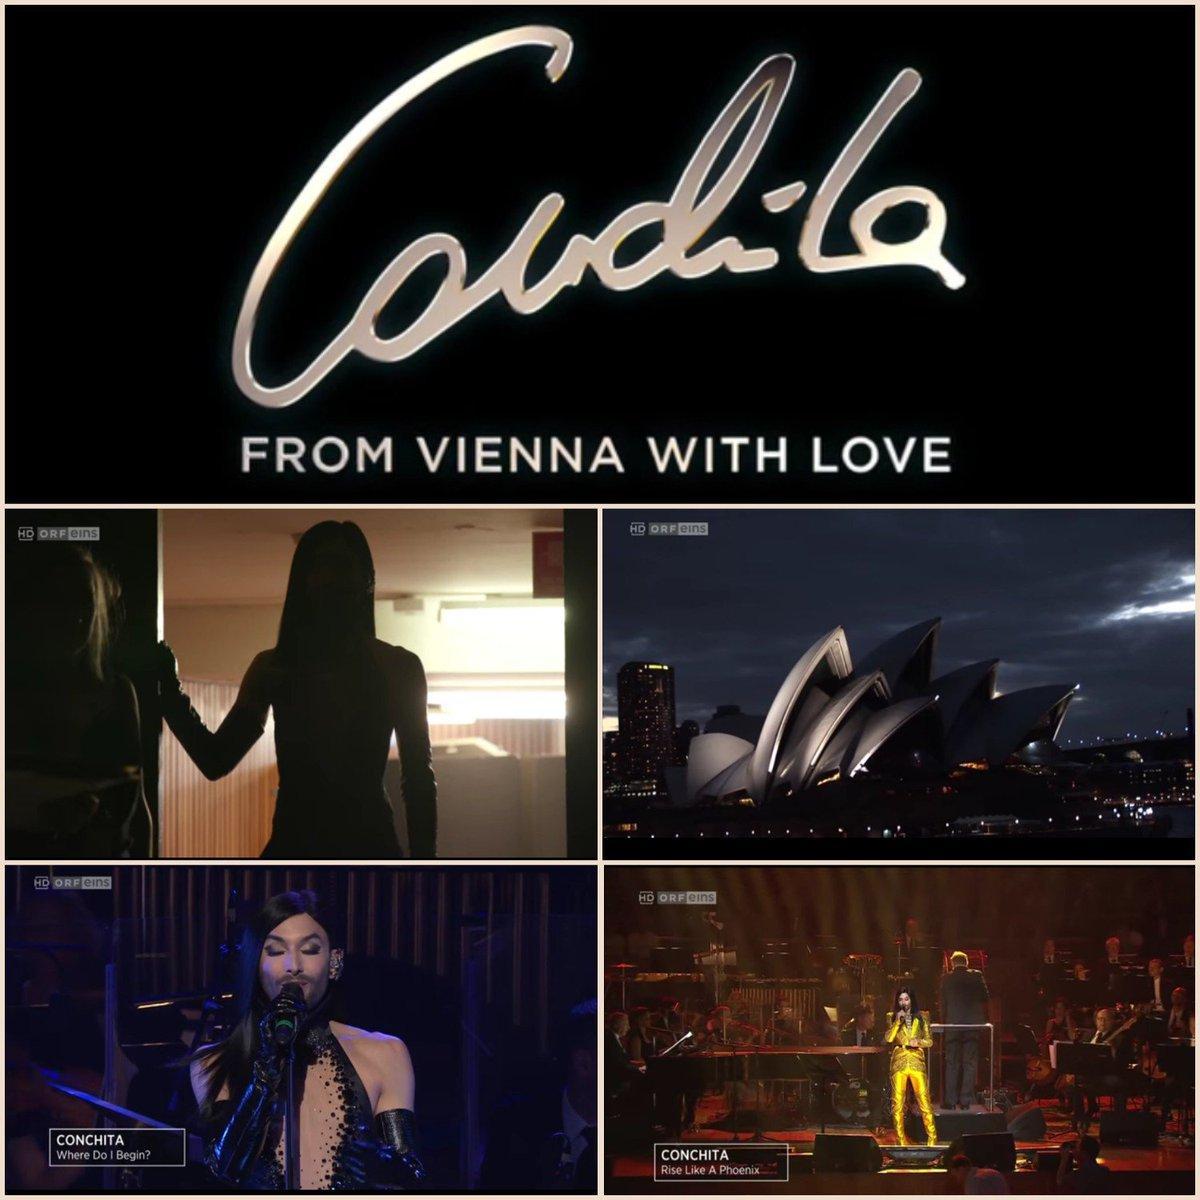 https:// m.youtube.com/watch?v=zX3u4I H8rMU&amp;feature=youtu.be &nbsp; …   Wonderful documentary - #ConchitaWurst - #FromViennaWithLove 3.3.2016 - Sydney Opera House  20.10.2018 #Conchita will sing with #ViennaSymphony at #WienerKonzerthaus I can&#39;t wait @ConchitaWurst All upcoming events  http:// conchitawurst.com/events/  &nbsp;  <br>http://pic.twitter.com/r6cqTld17N